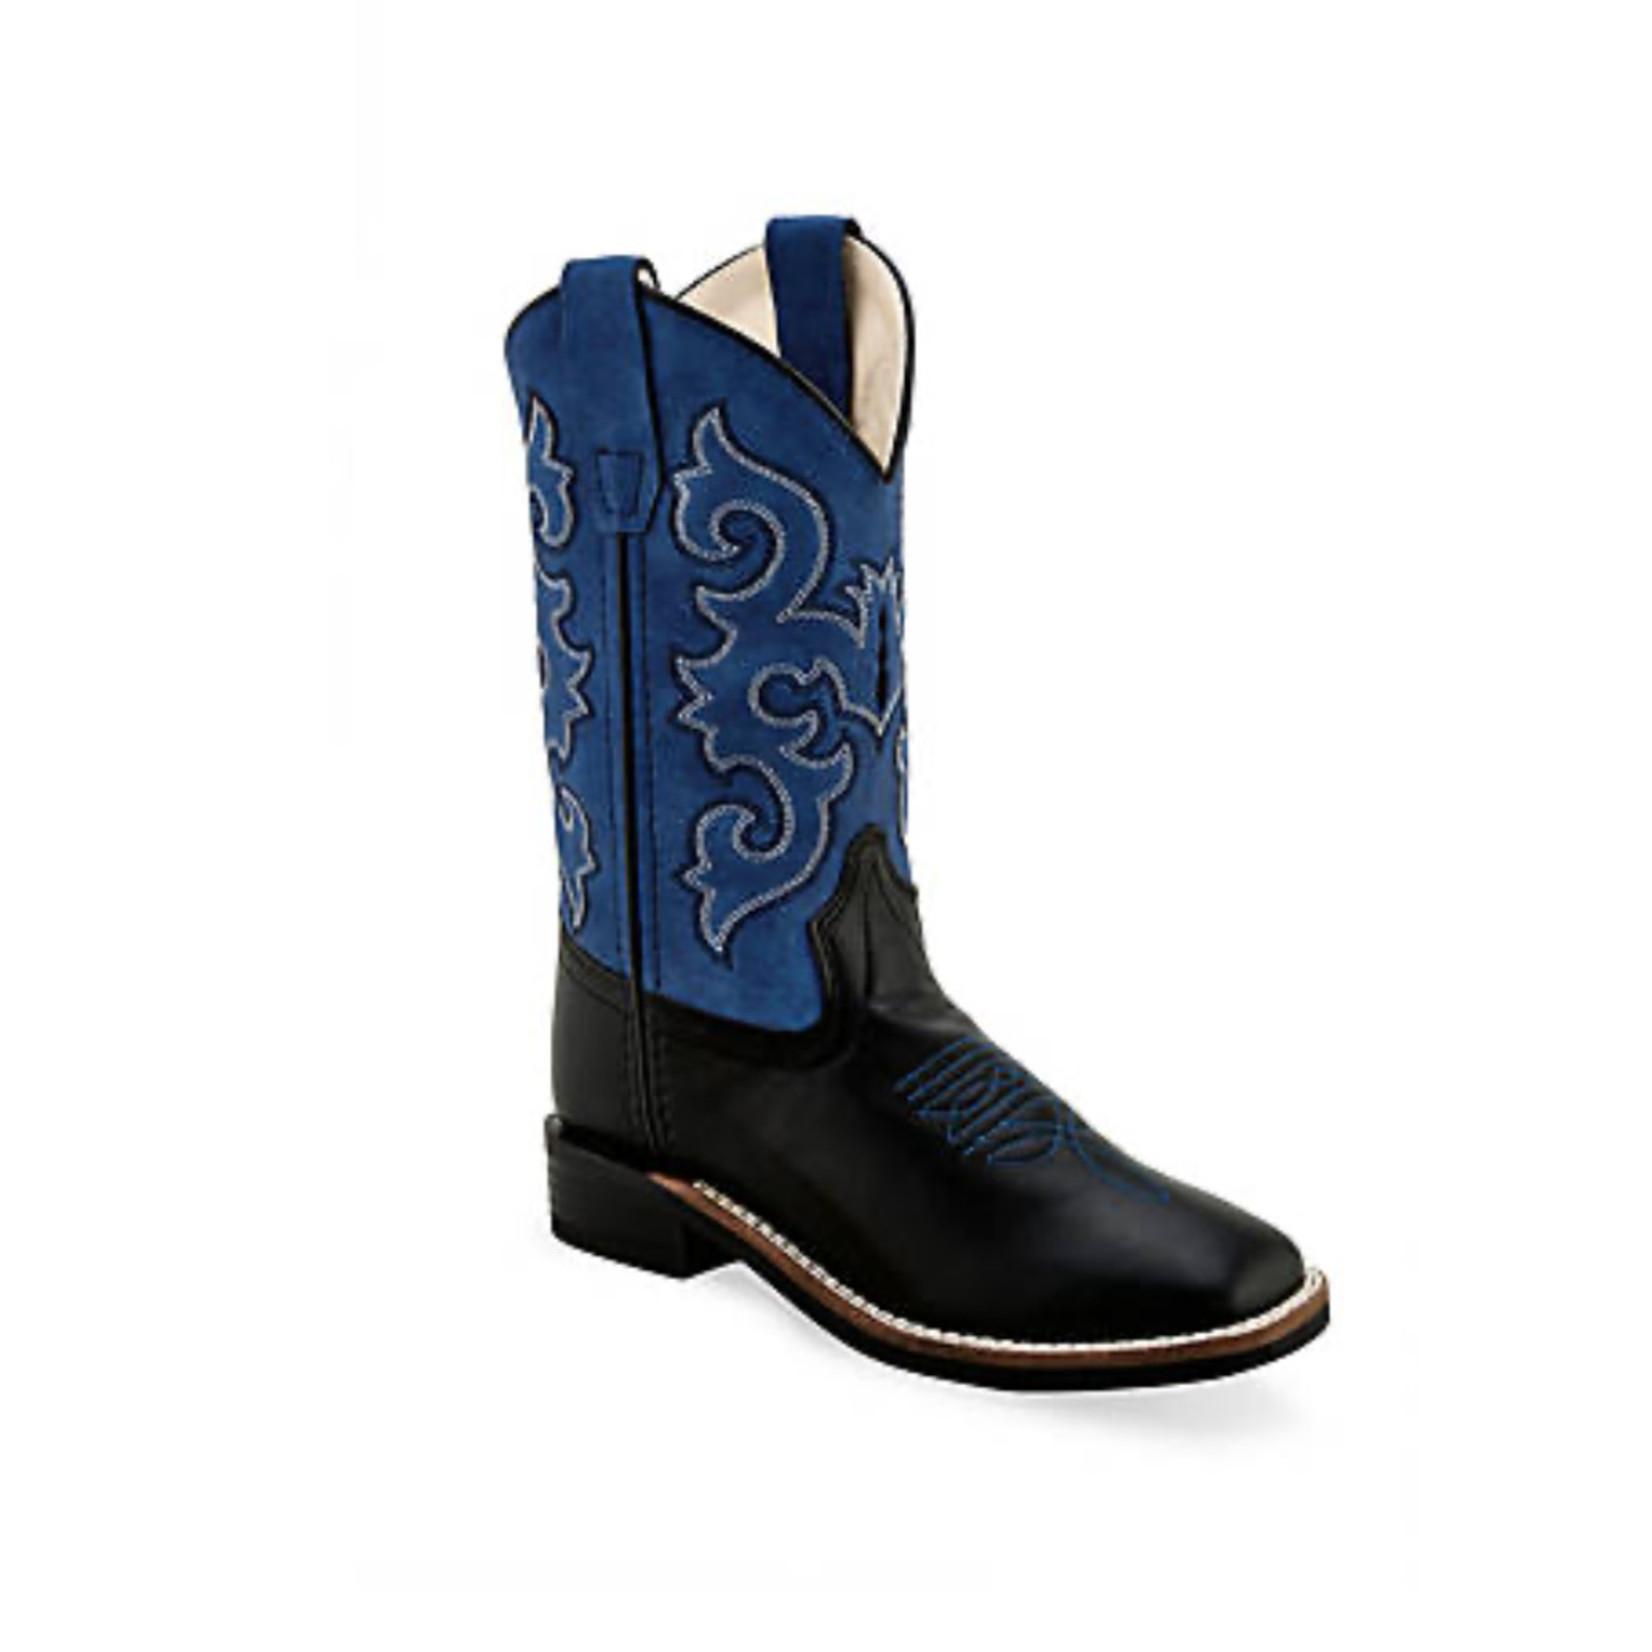 Old west Old West Blue / Black YOUTH Cowboy Boot VB9137